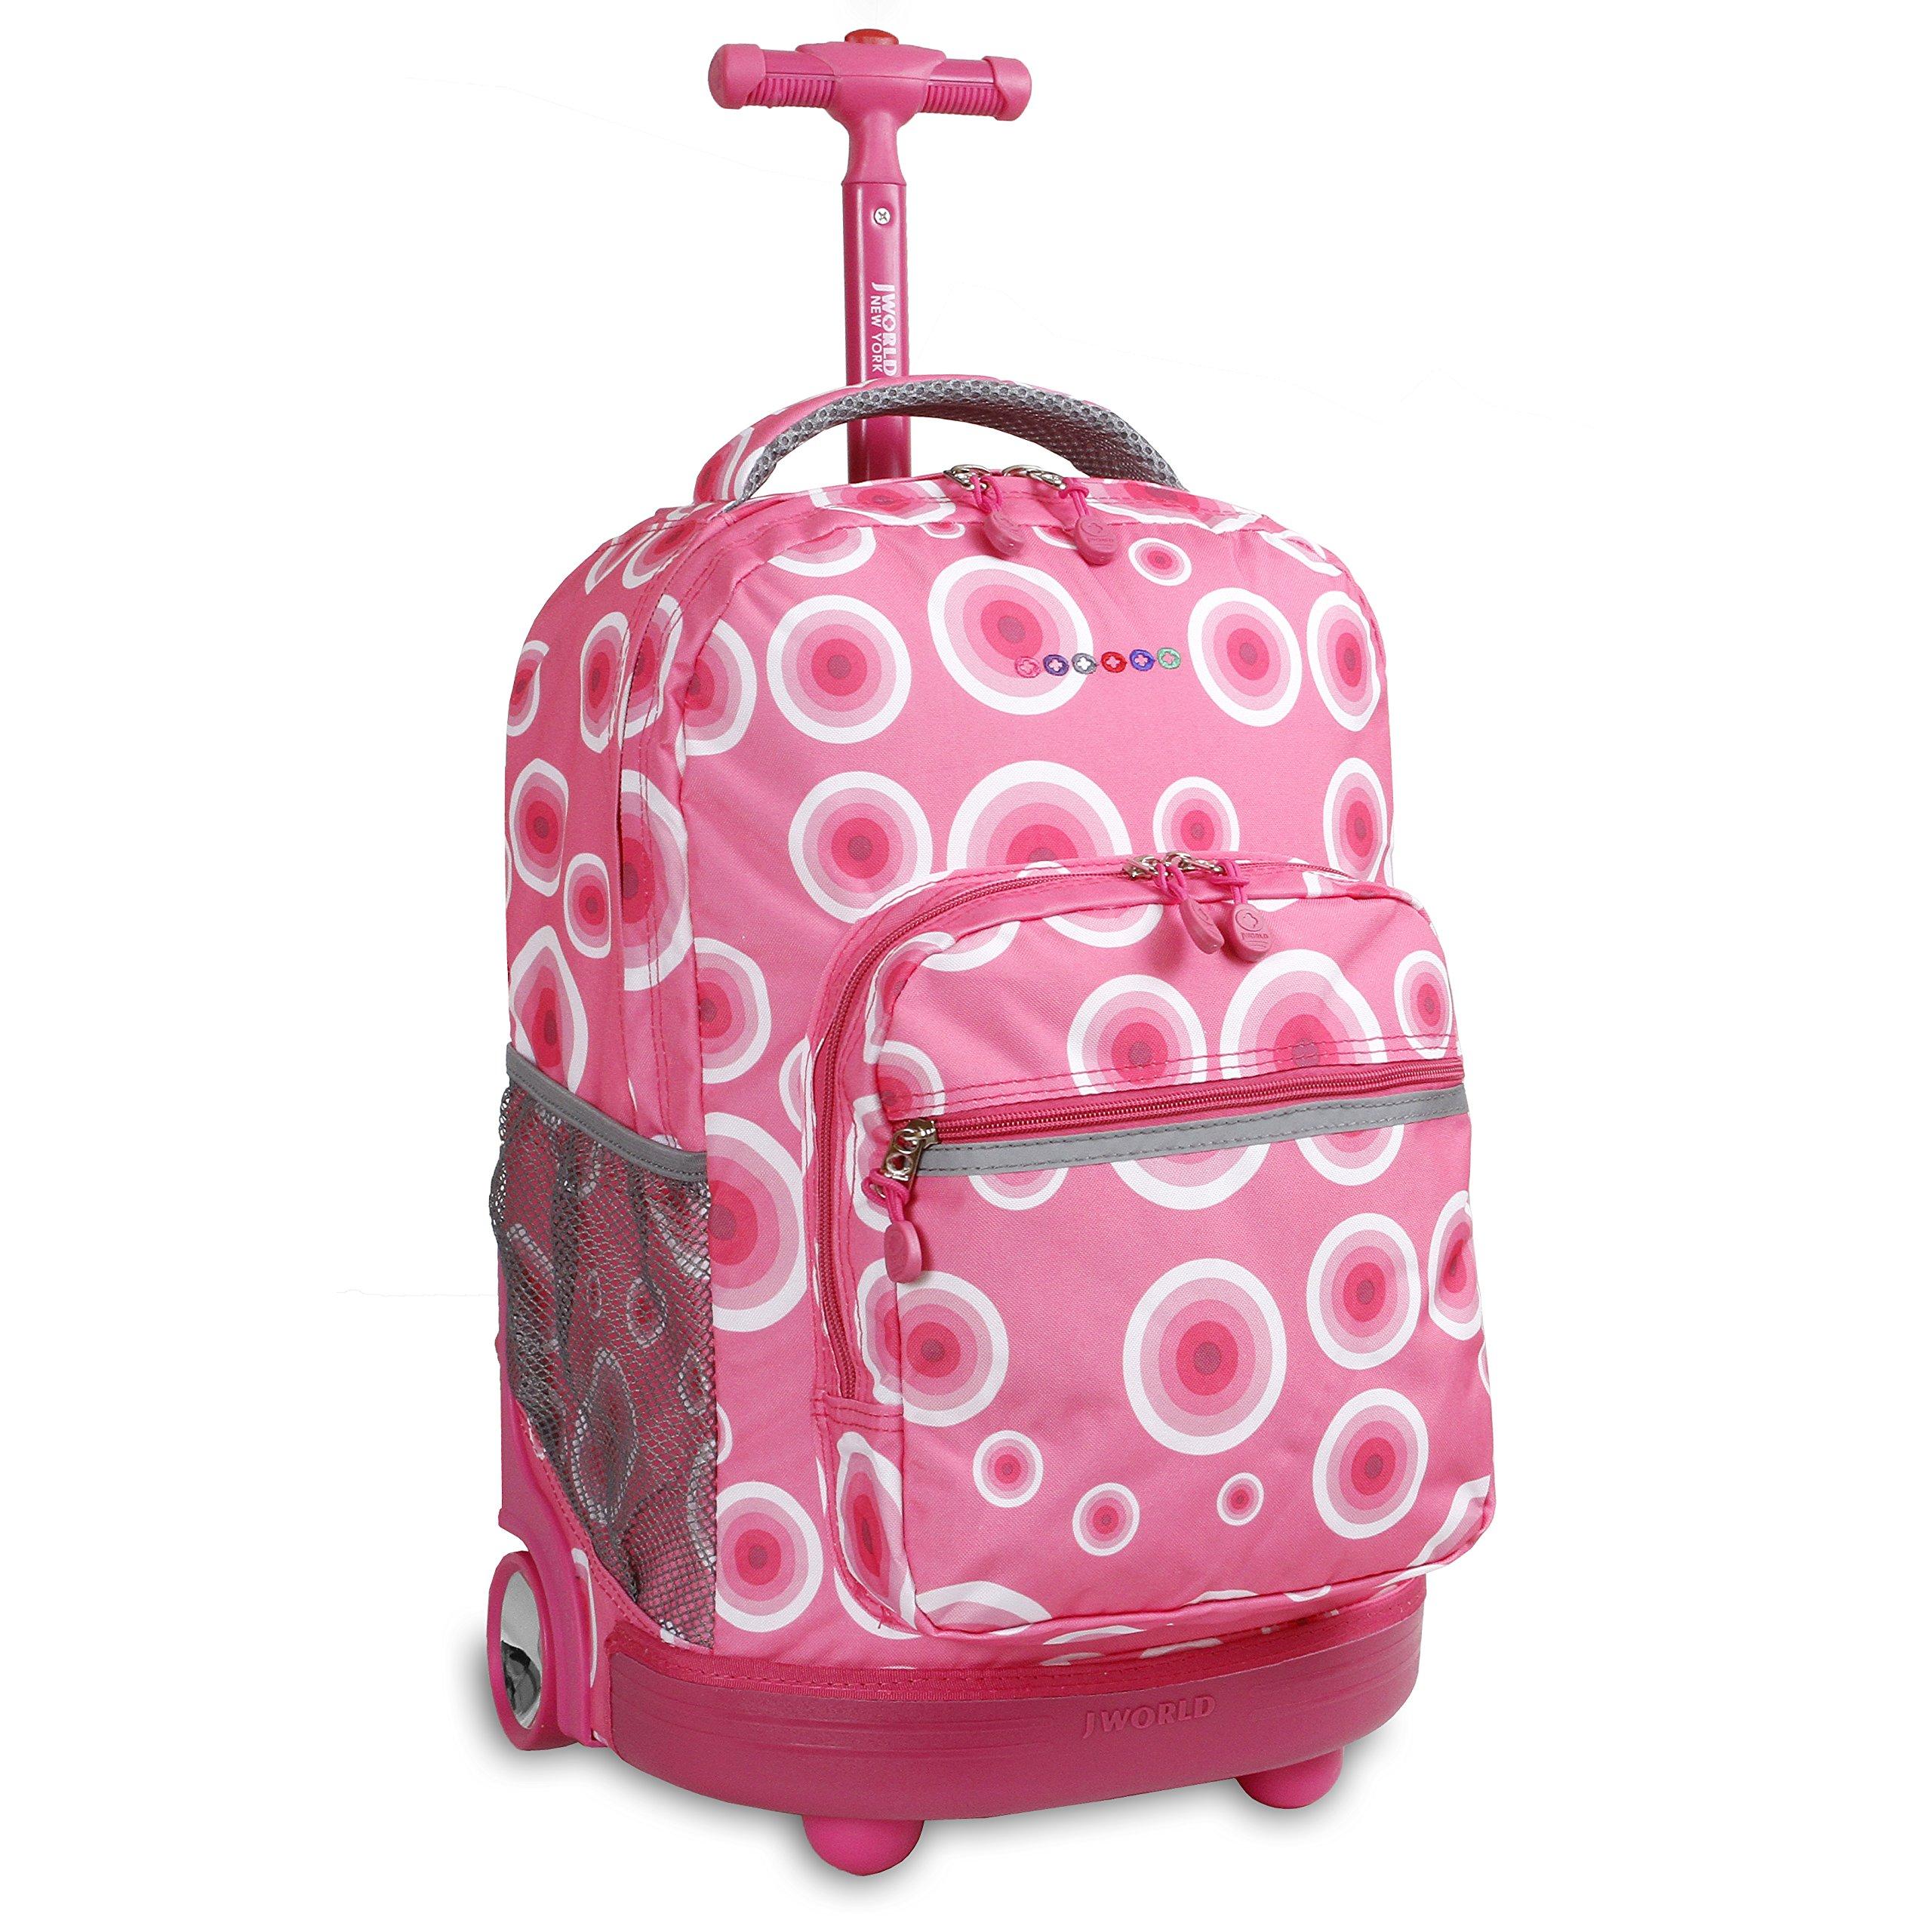 J World New York Sunrise Rolling Backpack, Pink Target, One Size